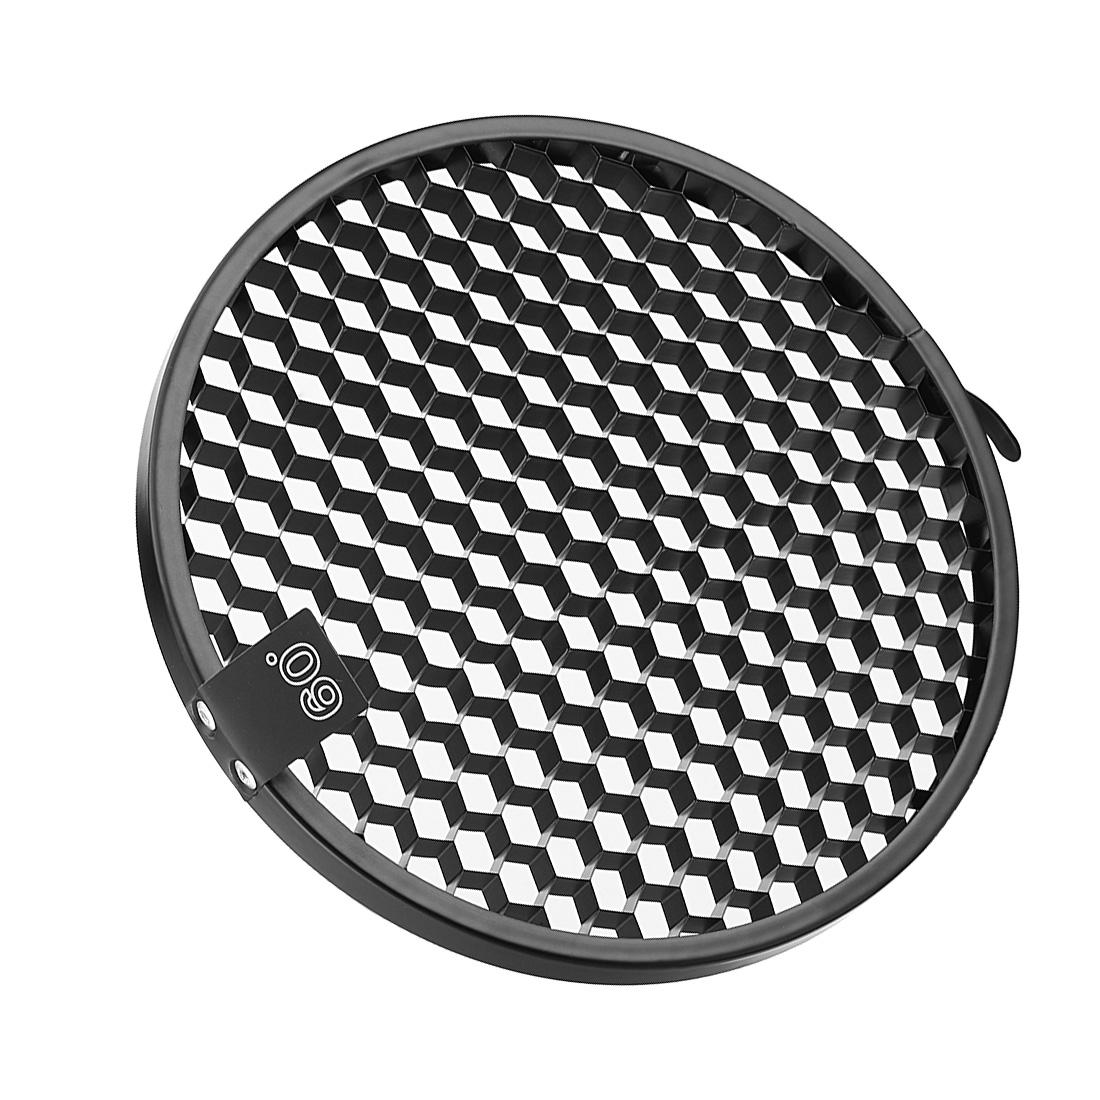 60 Degree Honeycomb Grid Black for 7-inch Reflector Diffuser Lamp Shade Dish